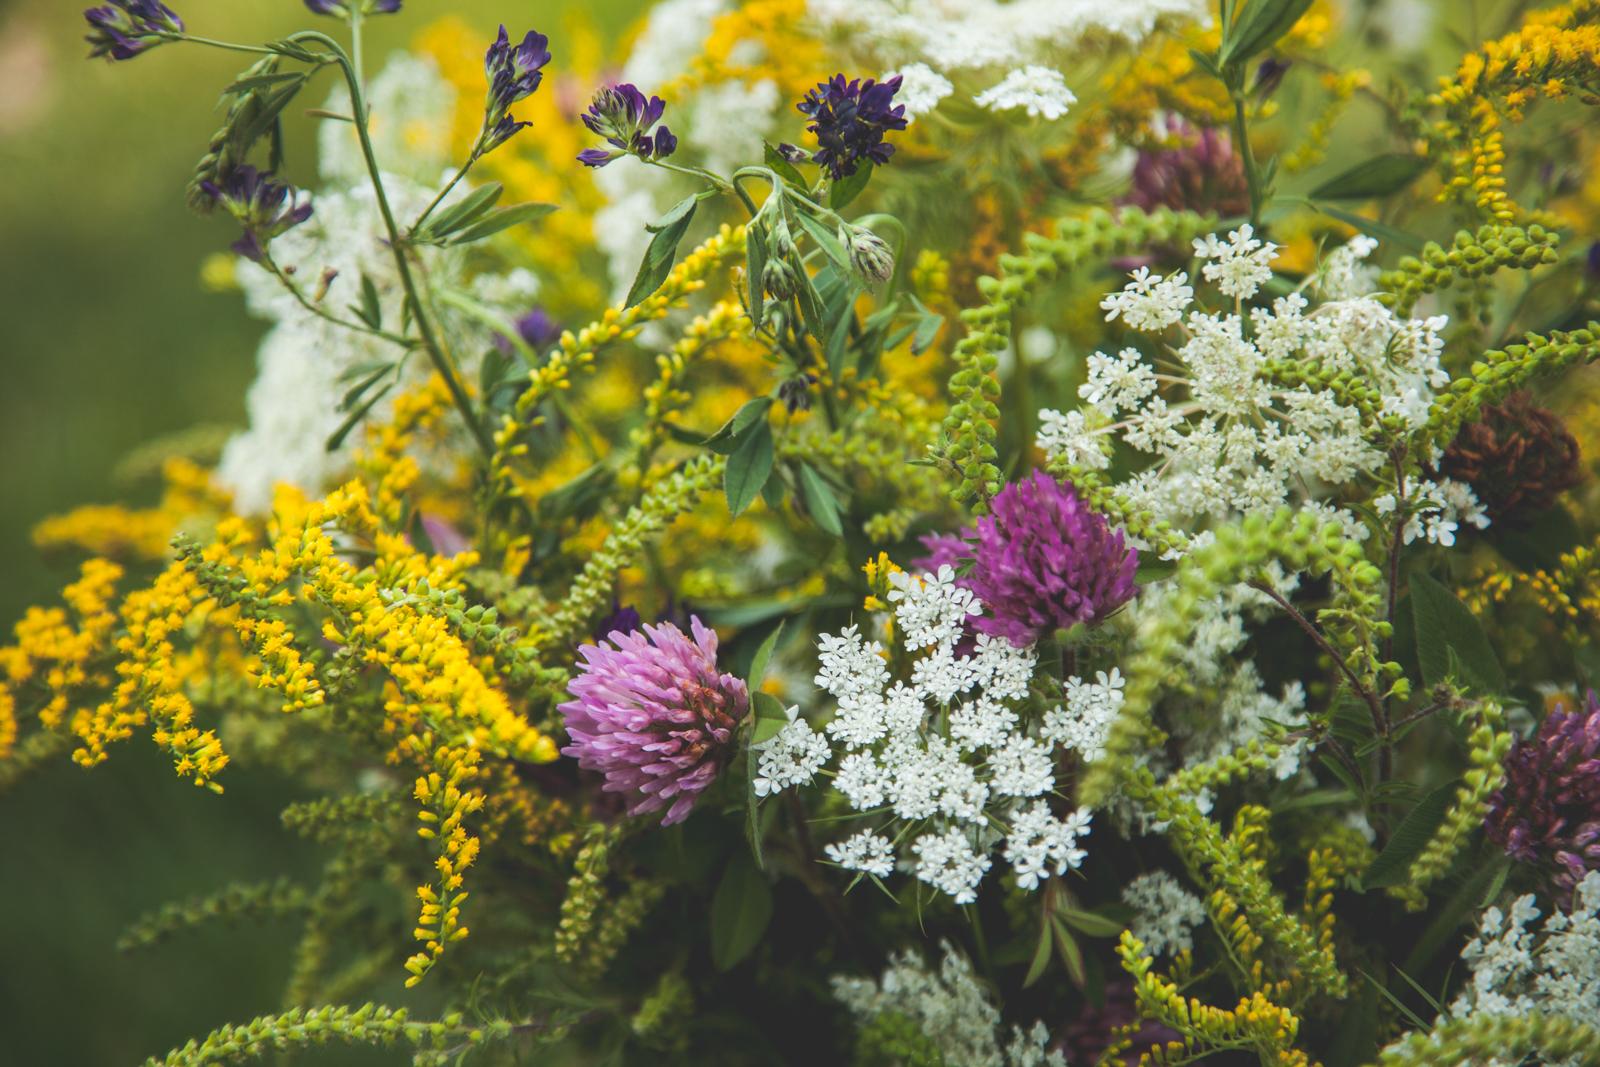 WildflowersPart2-sm-0548.jpg